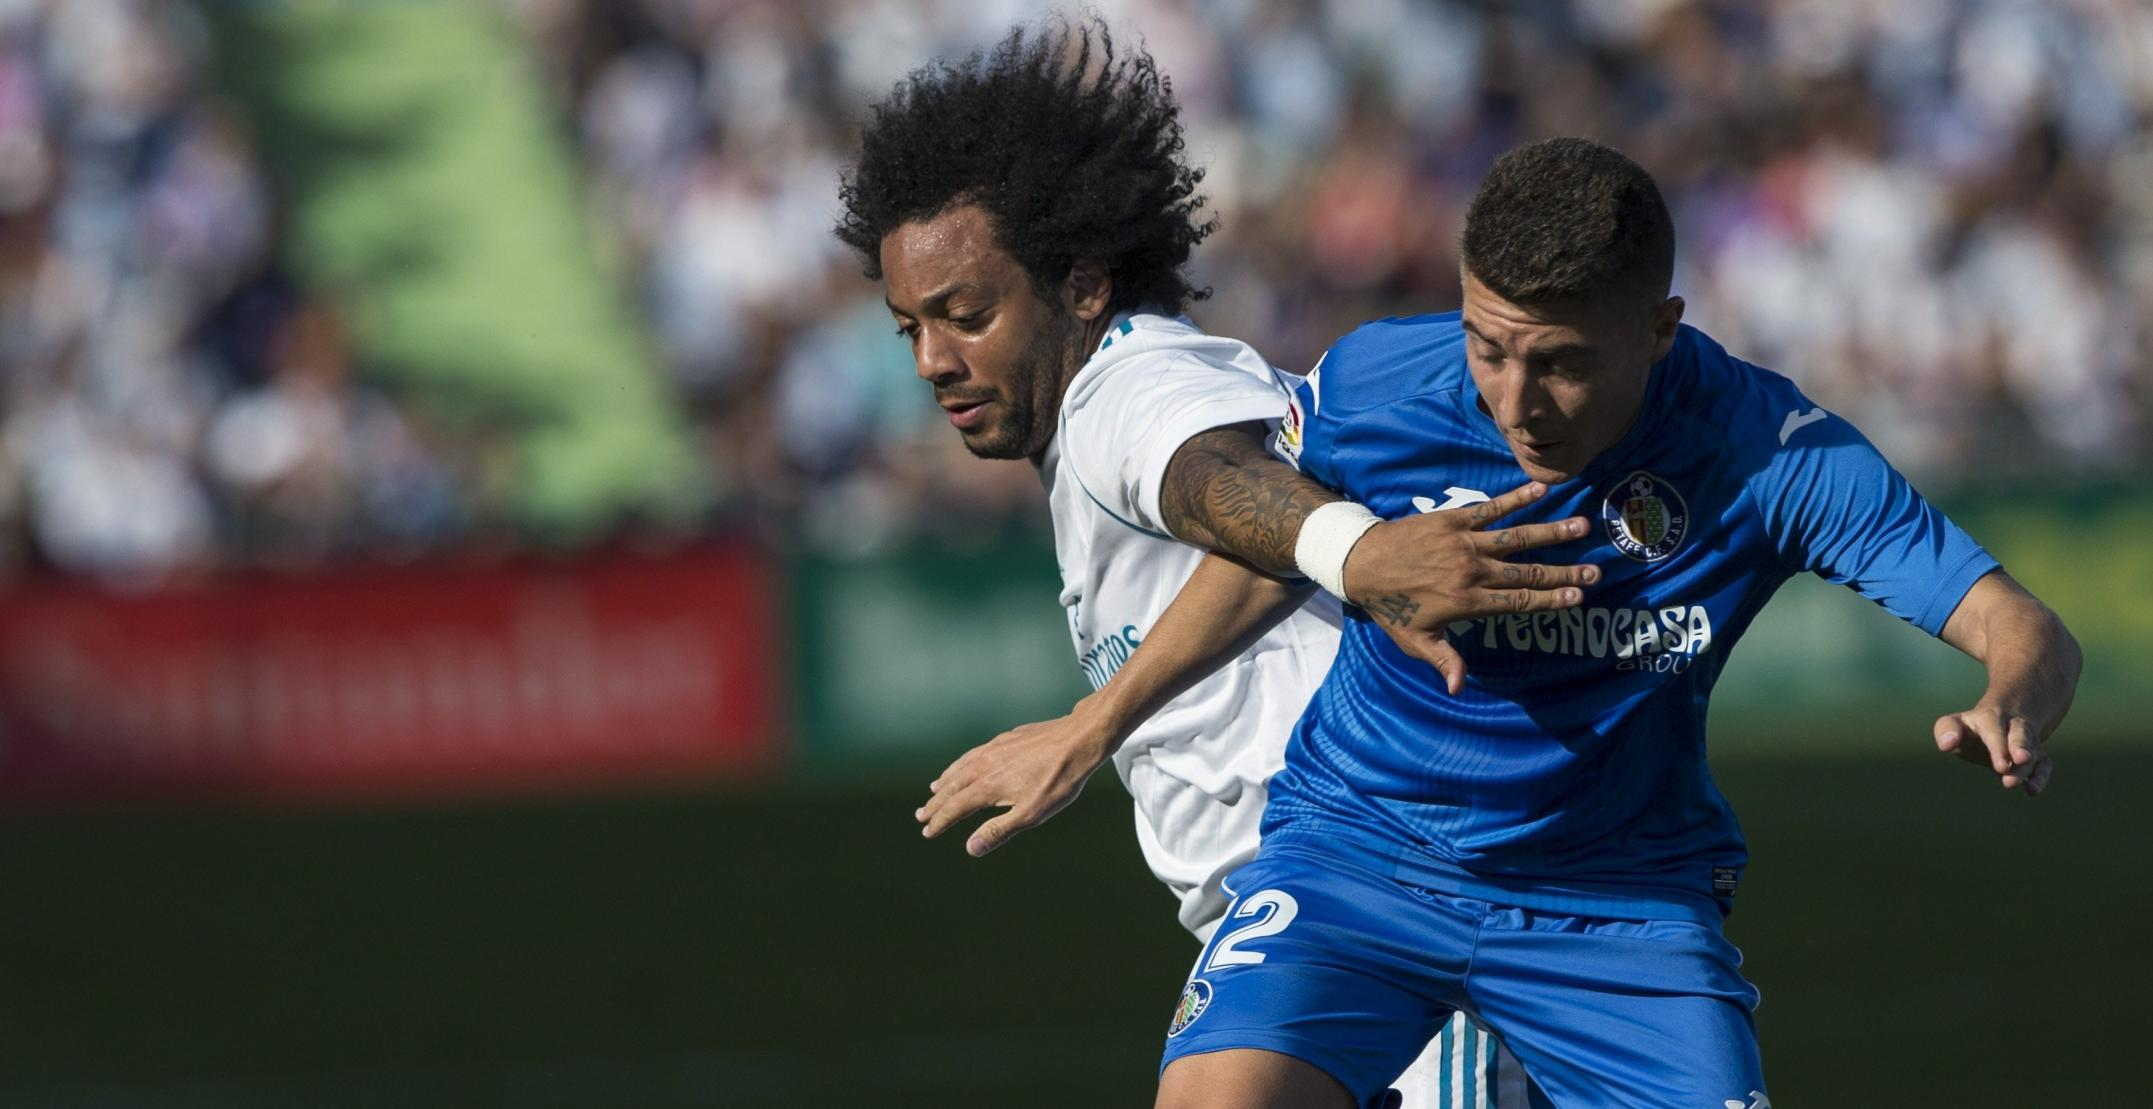 La Fiscalía se querella contra el futbolista Marcelo por un fraude fiscal de 491.000 euros